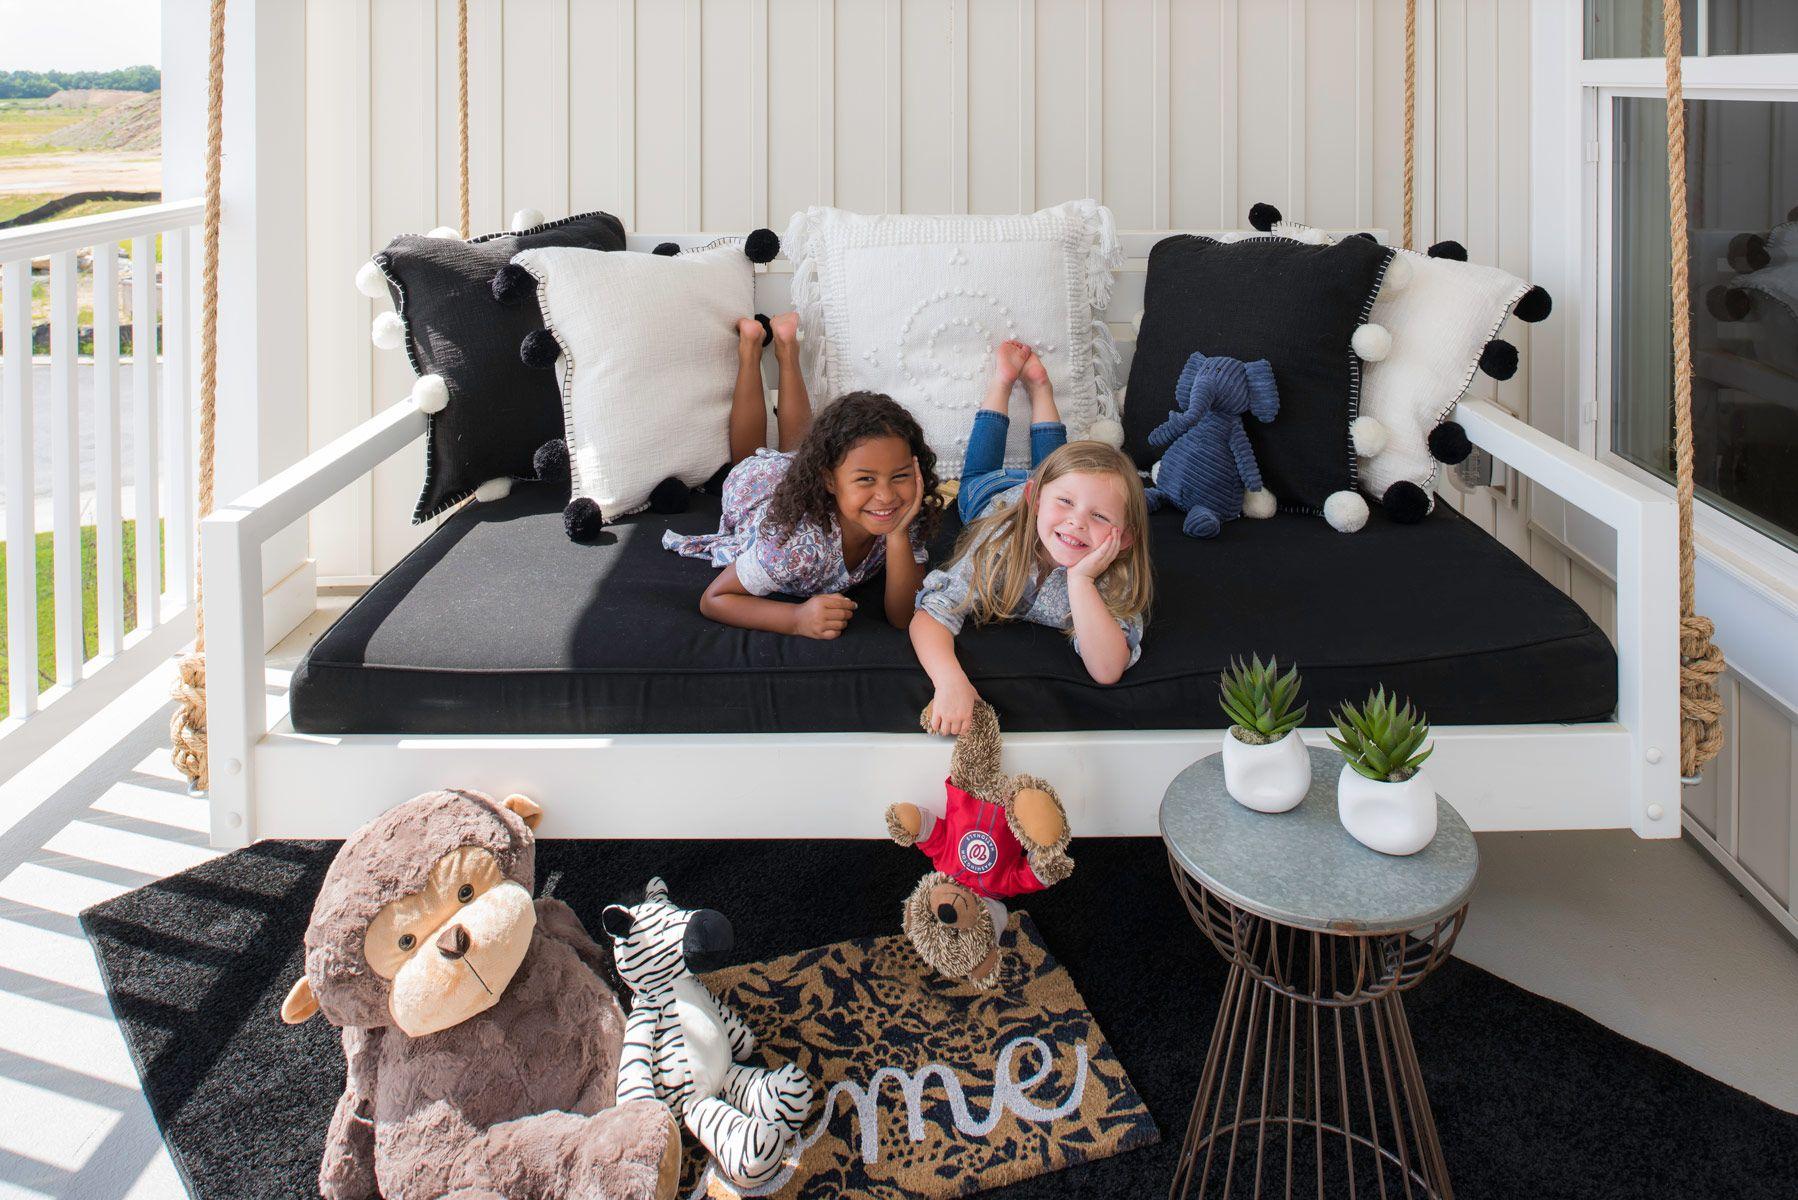 Little girls on porch swing holding teddy bear